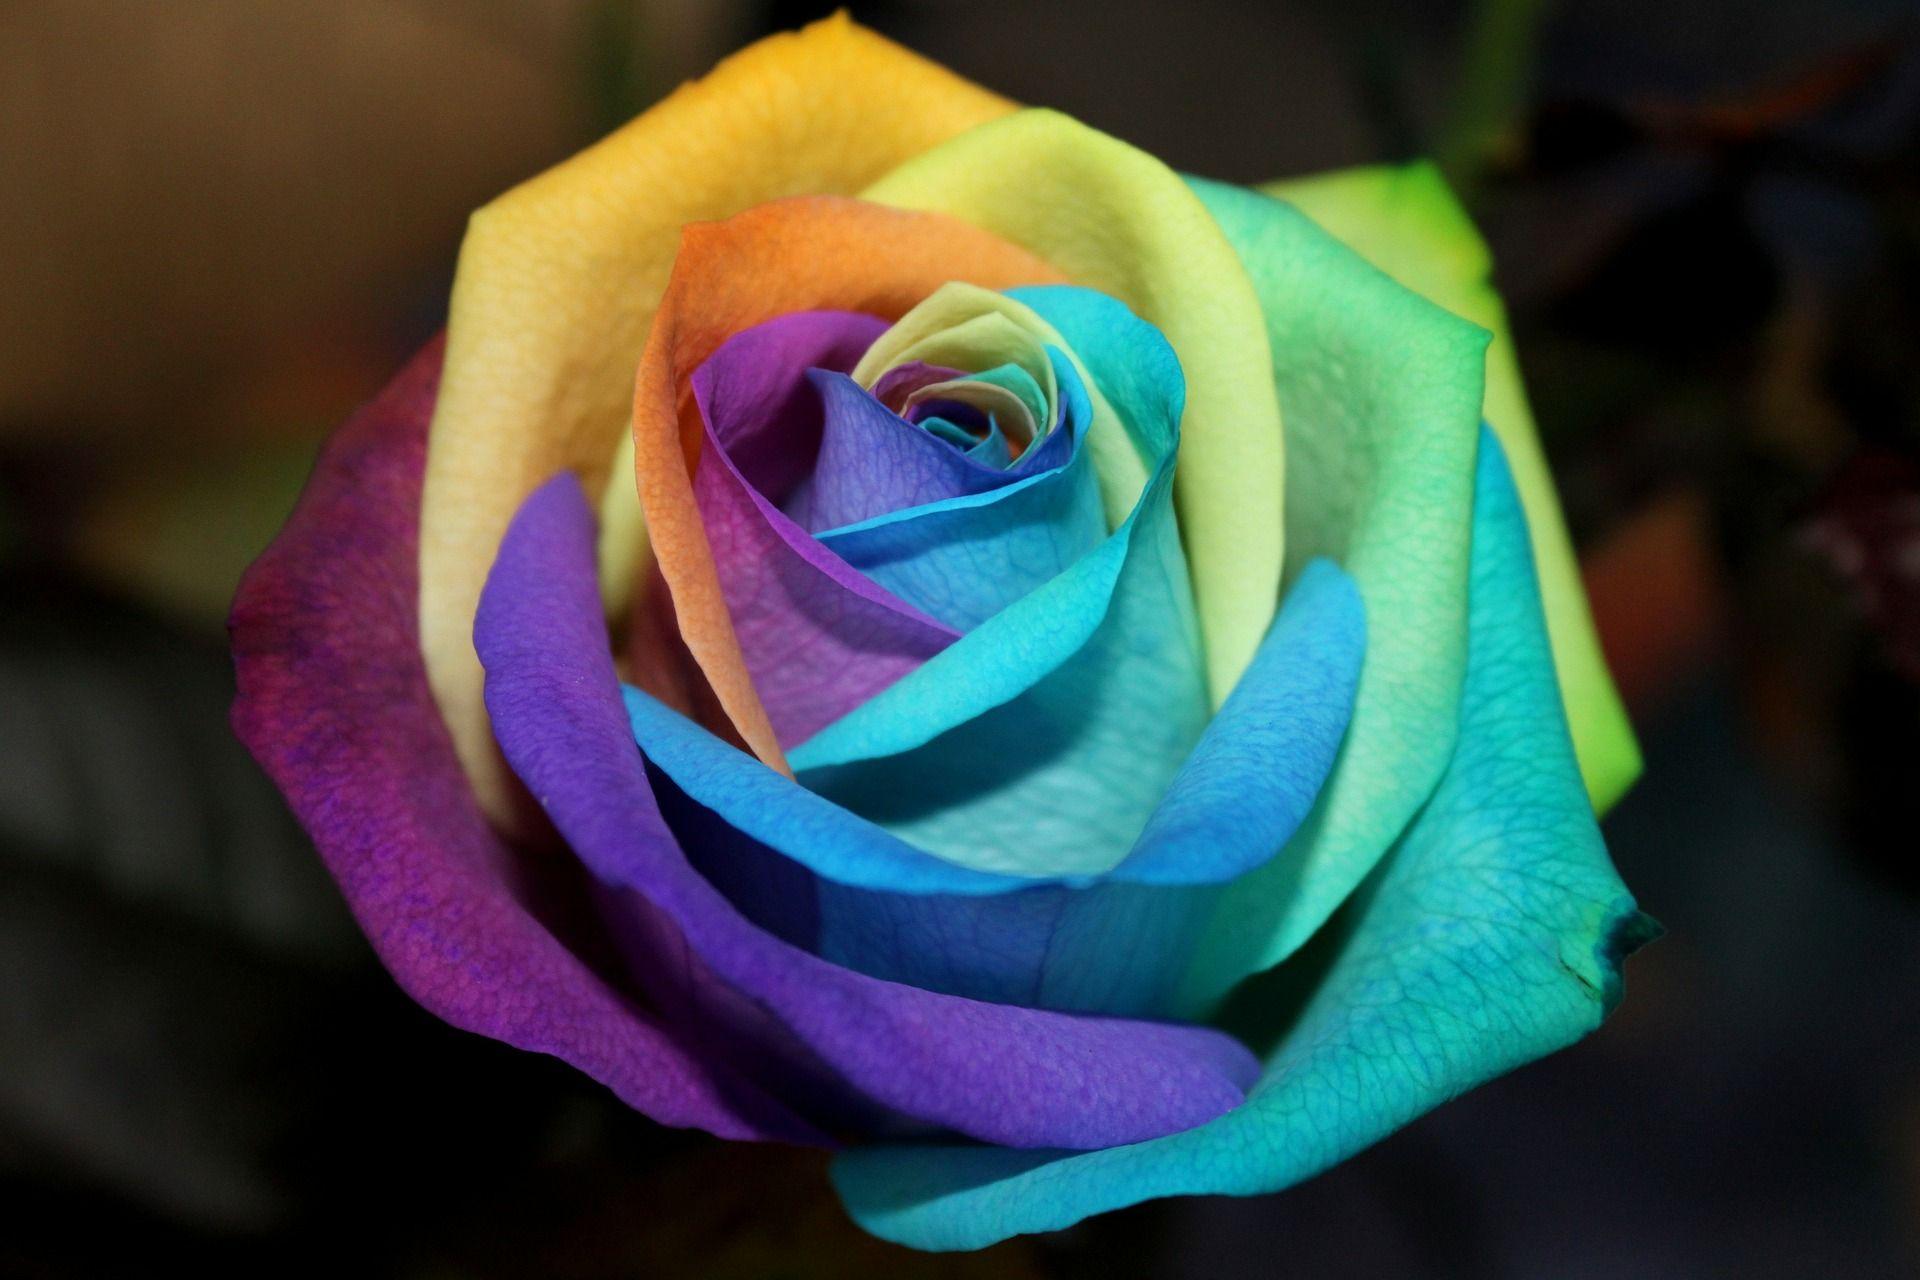 Rainbow rose desktop background 1920 1280 for 2 color roses